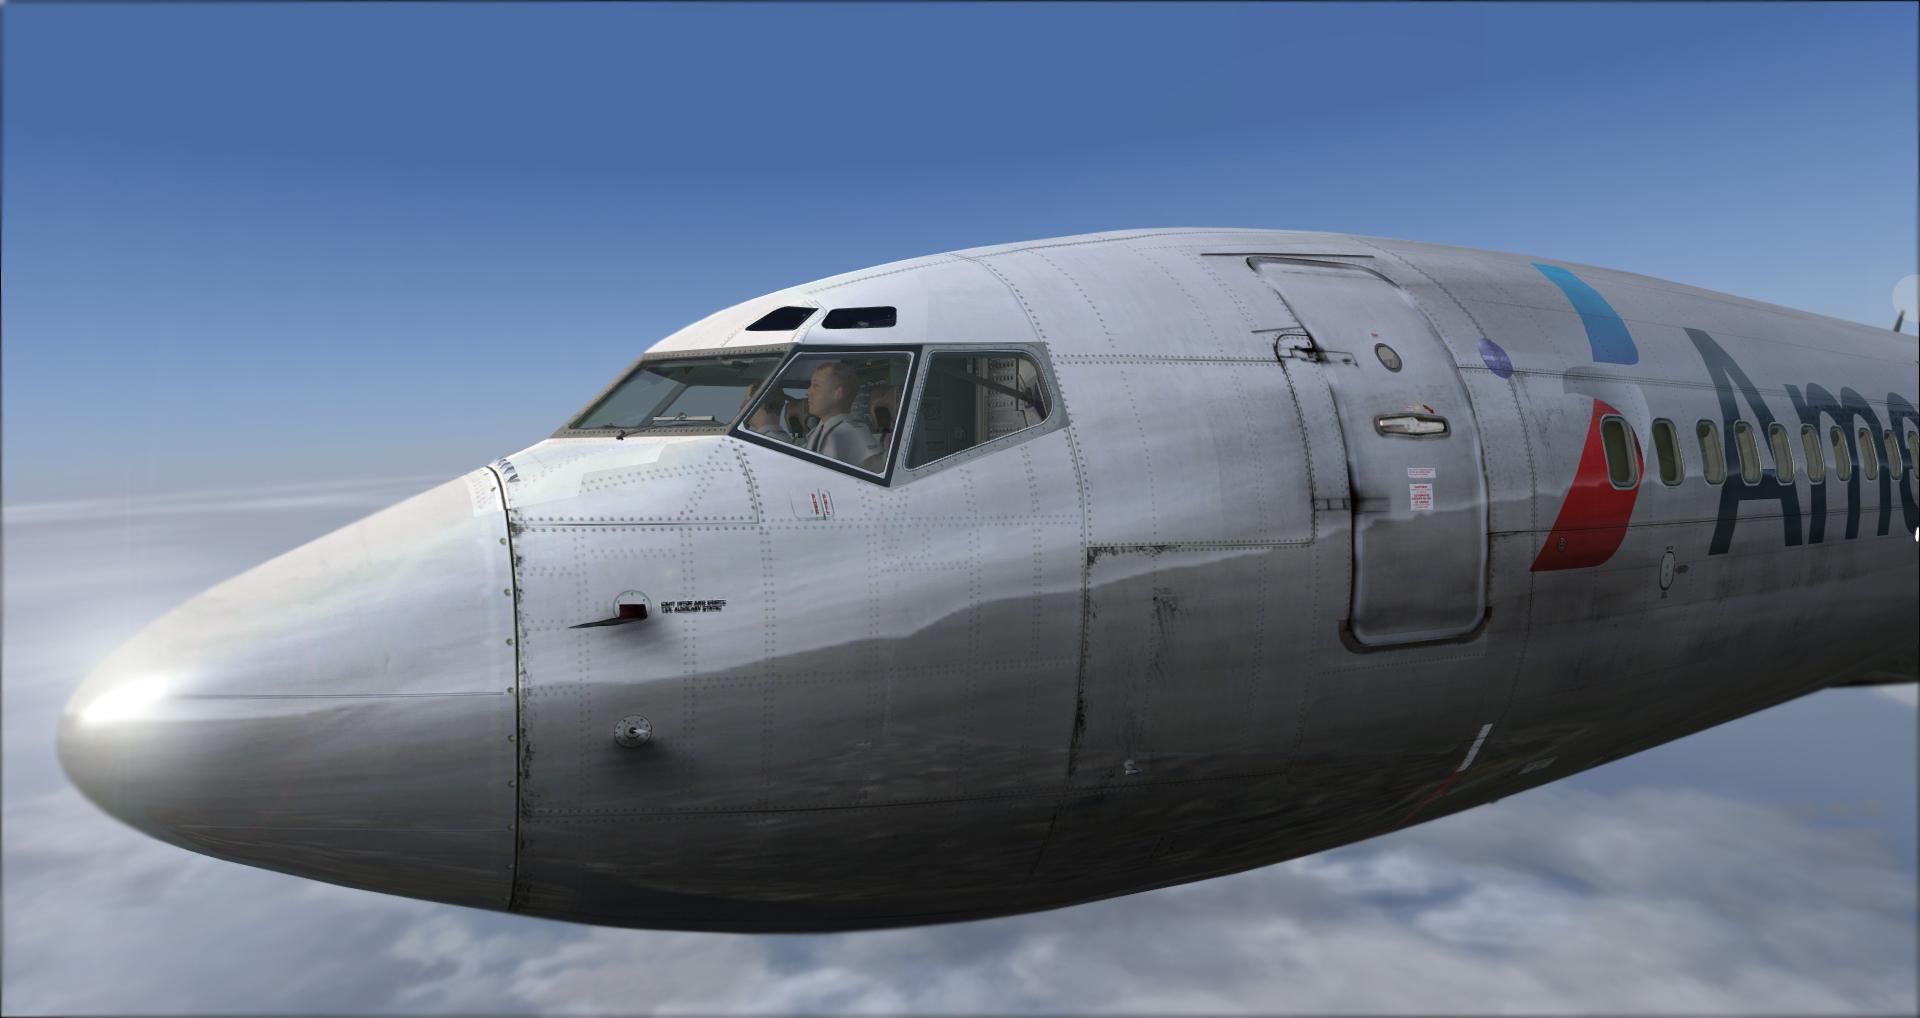 American Airlines PMDG 737-800NGX HD by miniarma on DeviantArt